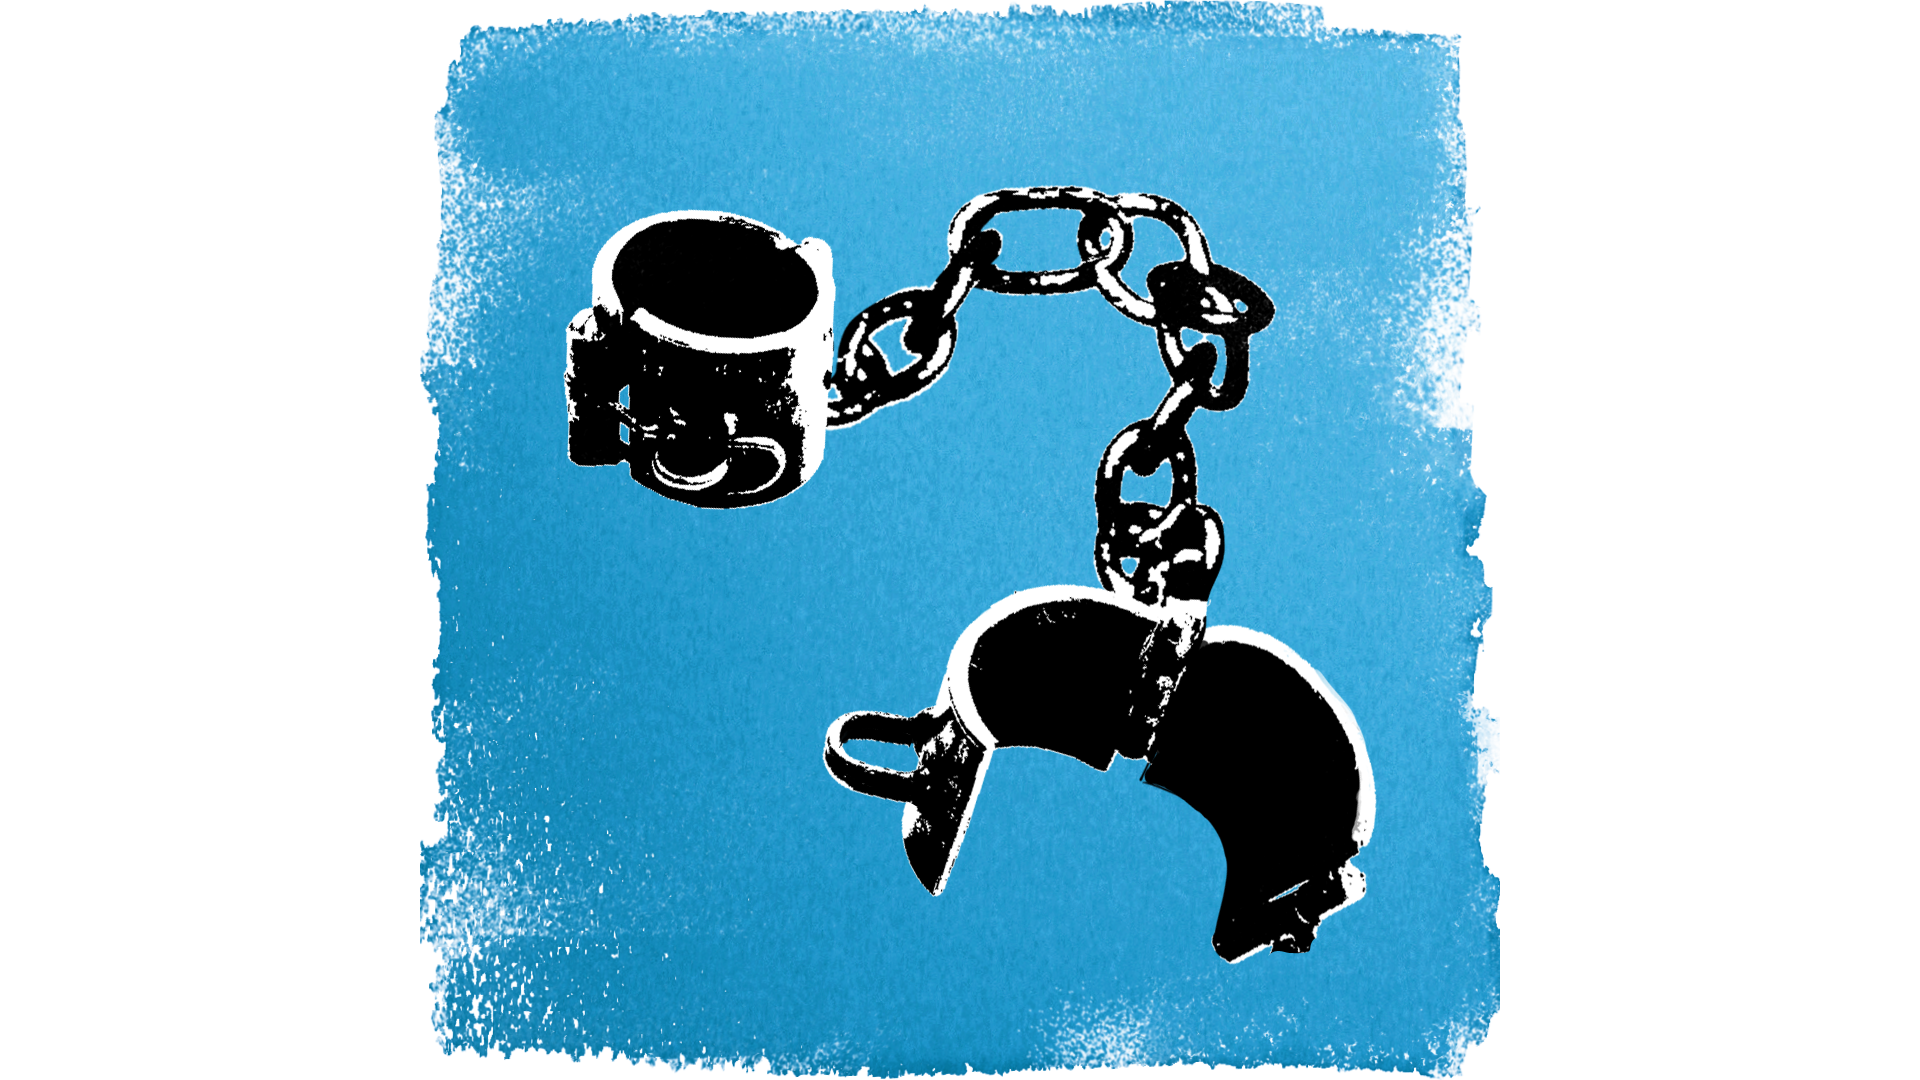 Stallion indier these mines. Handcuffs clipart tether